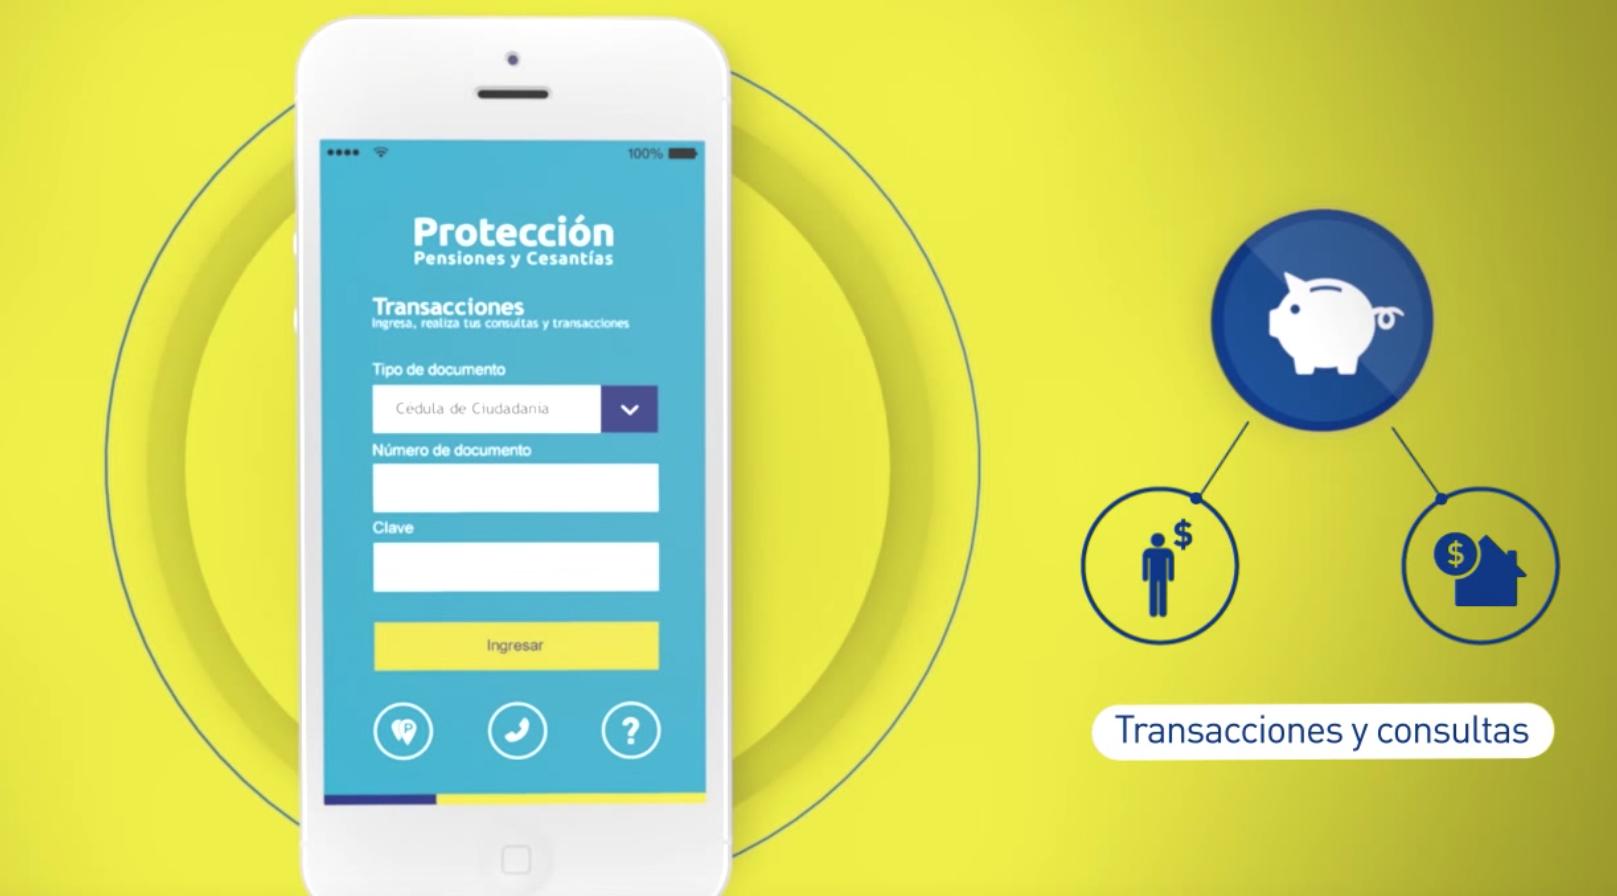 c_acceso_directo_proteccion.png